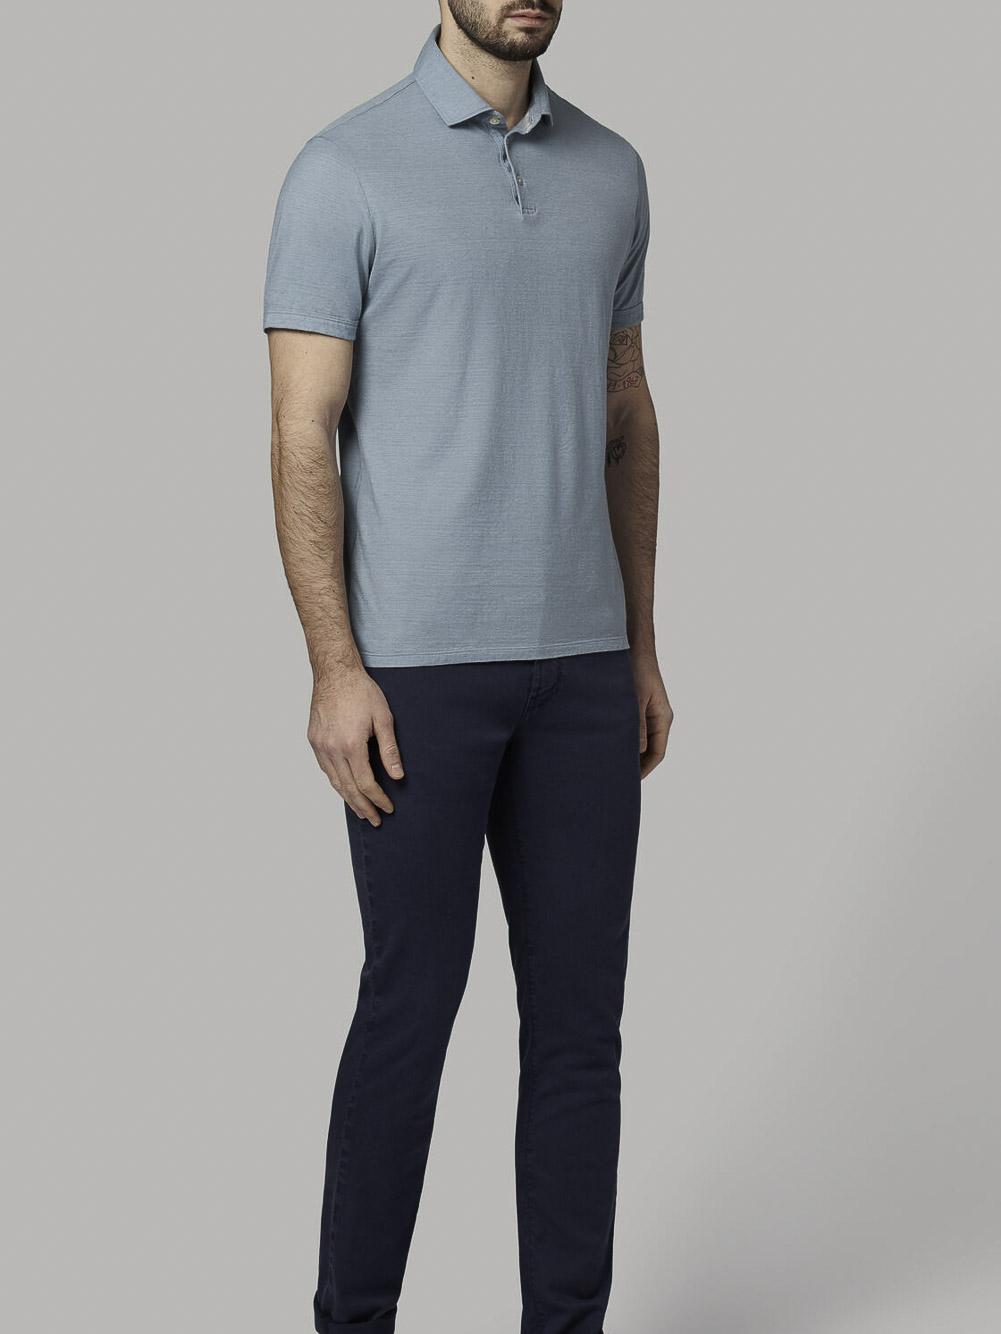 BOGGI Μπλούζα polo B021P023501 ΣΙΕΛ